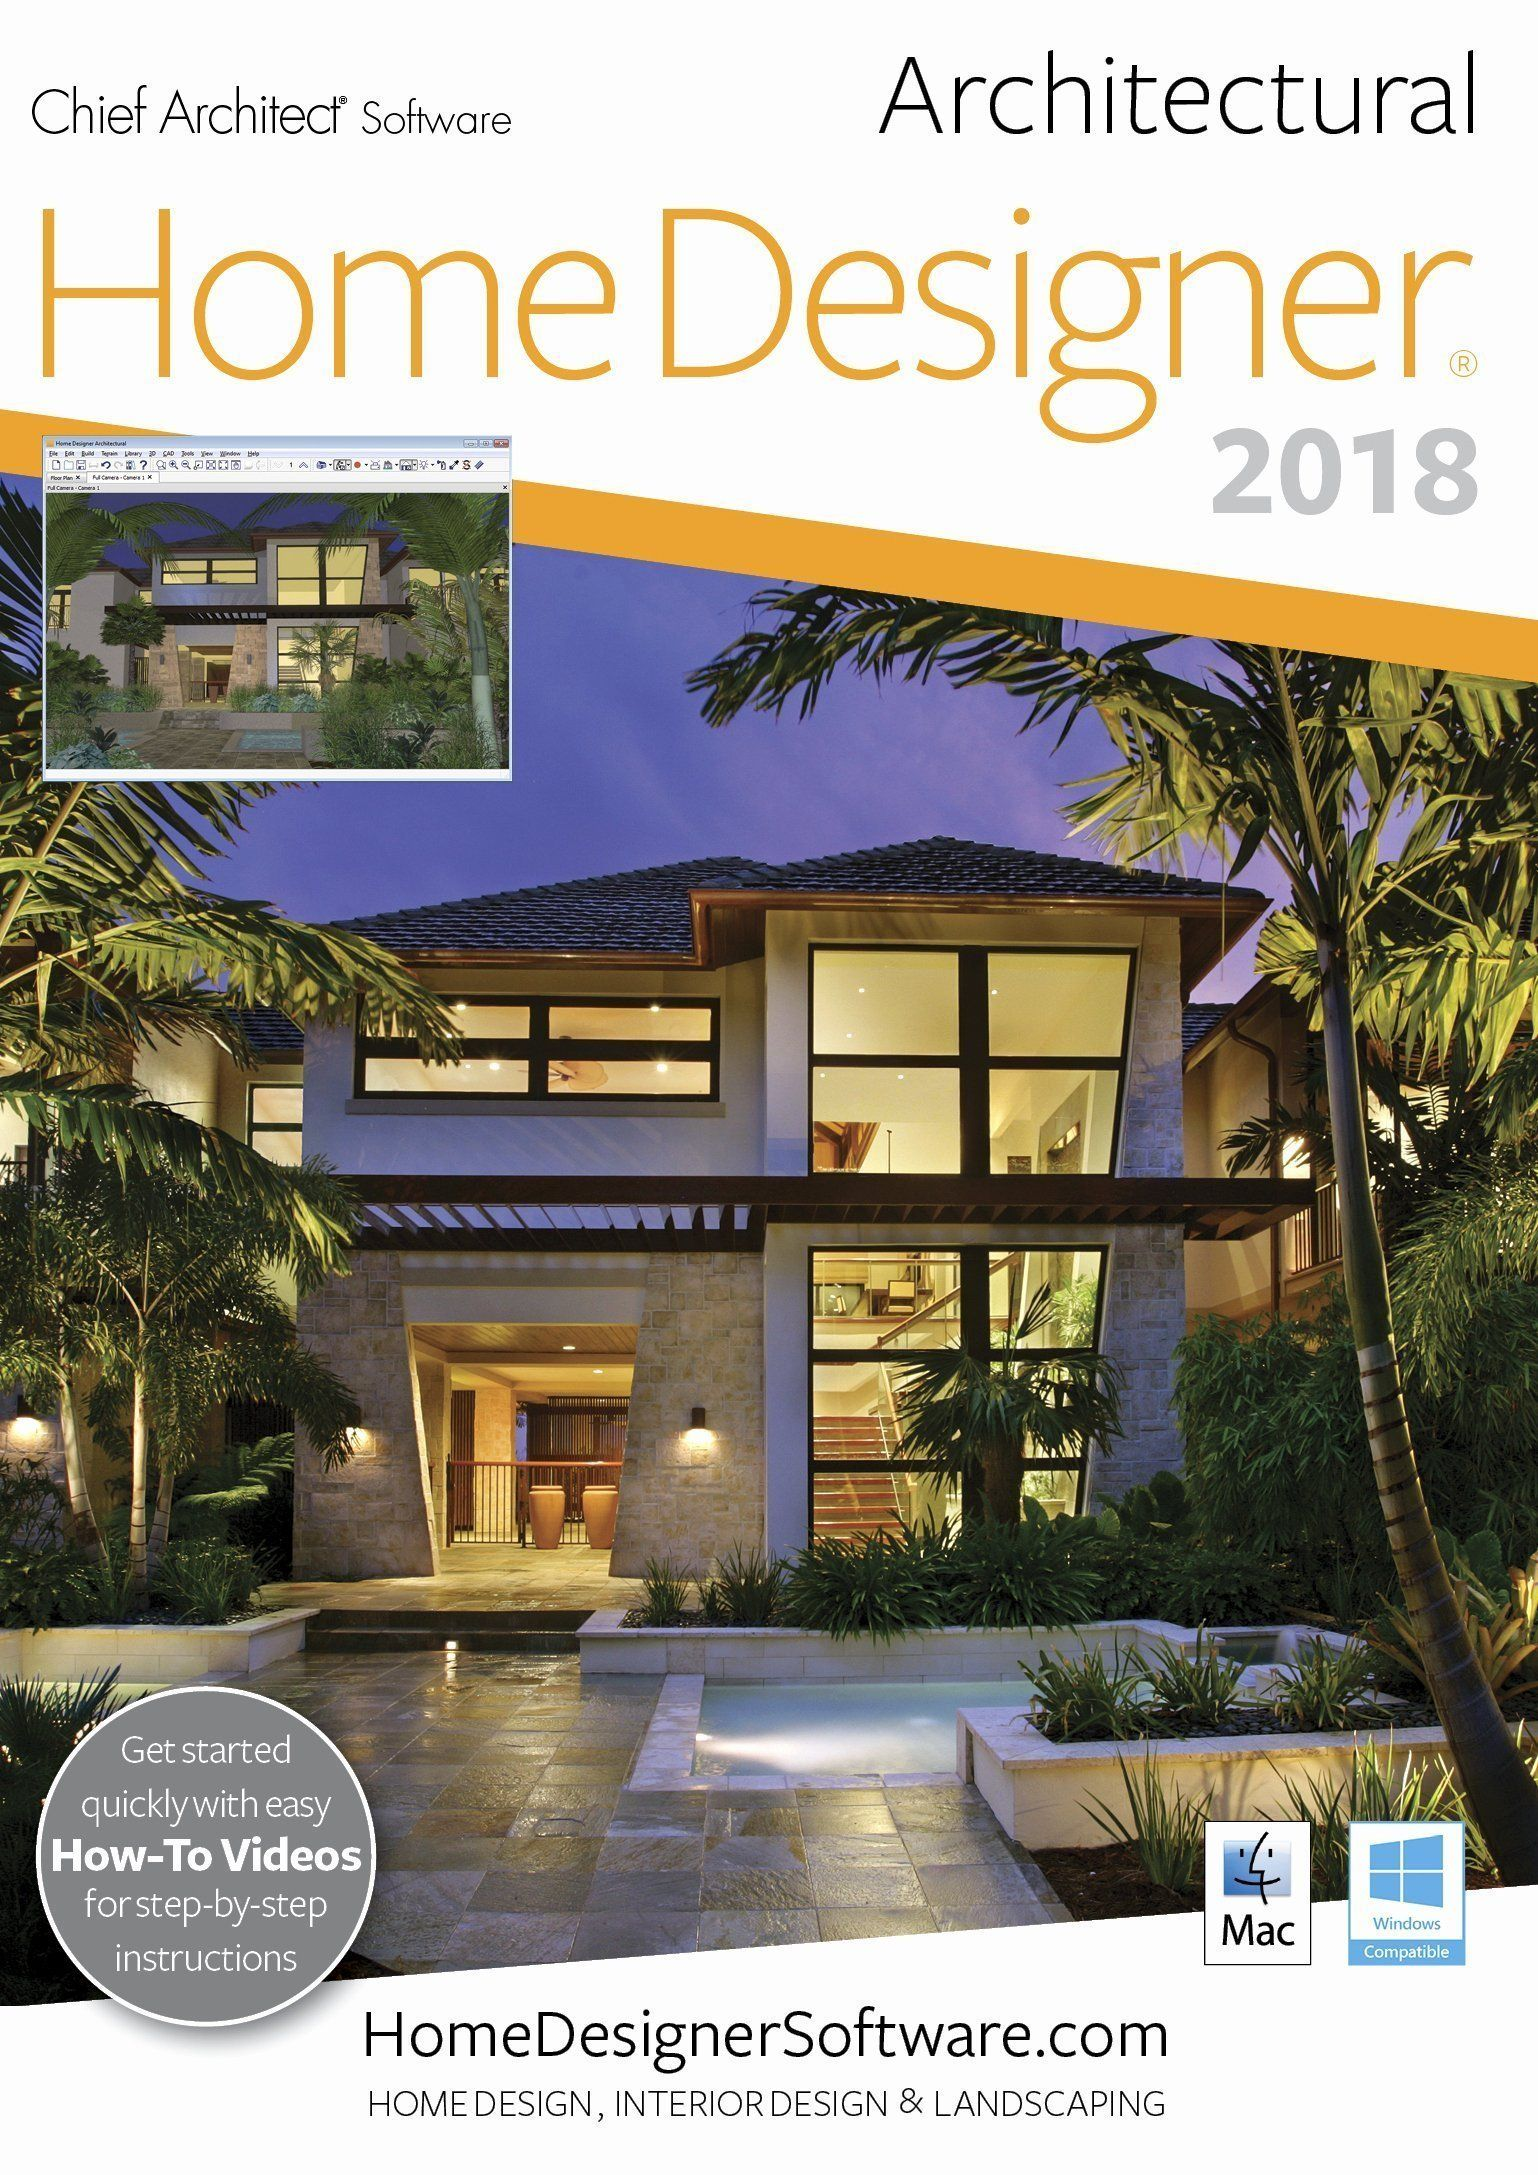 Hgtv Ultimate Home Design Download Inspirational Home Architect Design In 2020 Best Home Design Software Home Design Software Architect Design